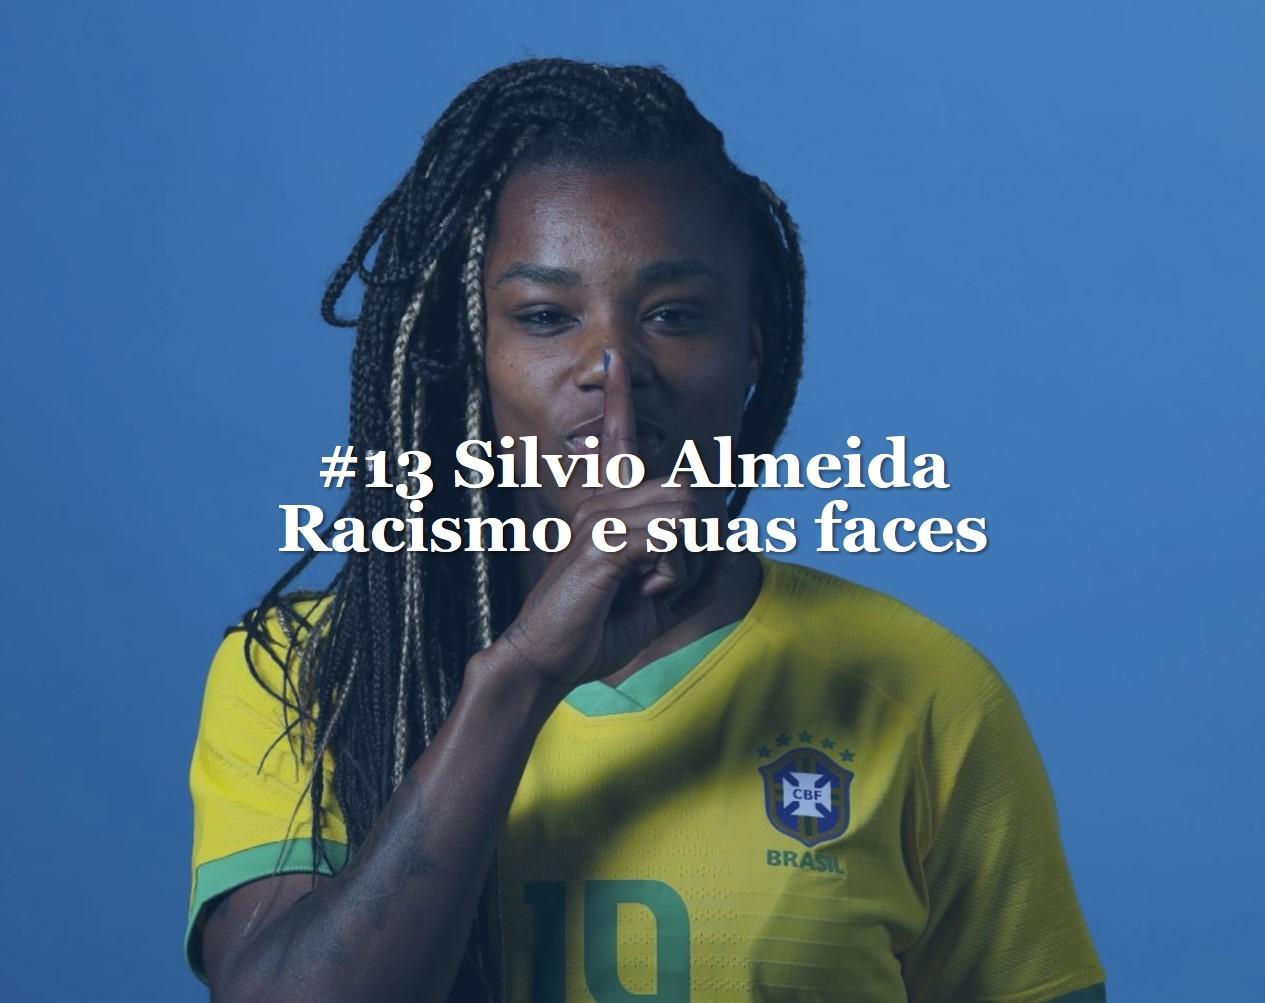 #13 Silvio Almeida - racismo e suas face